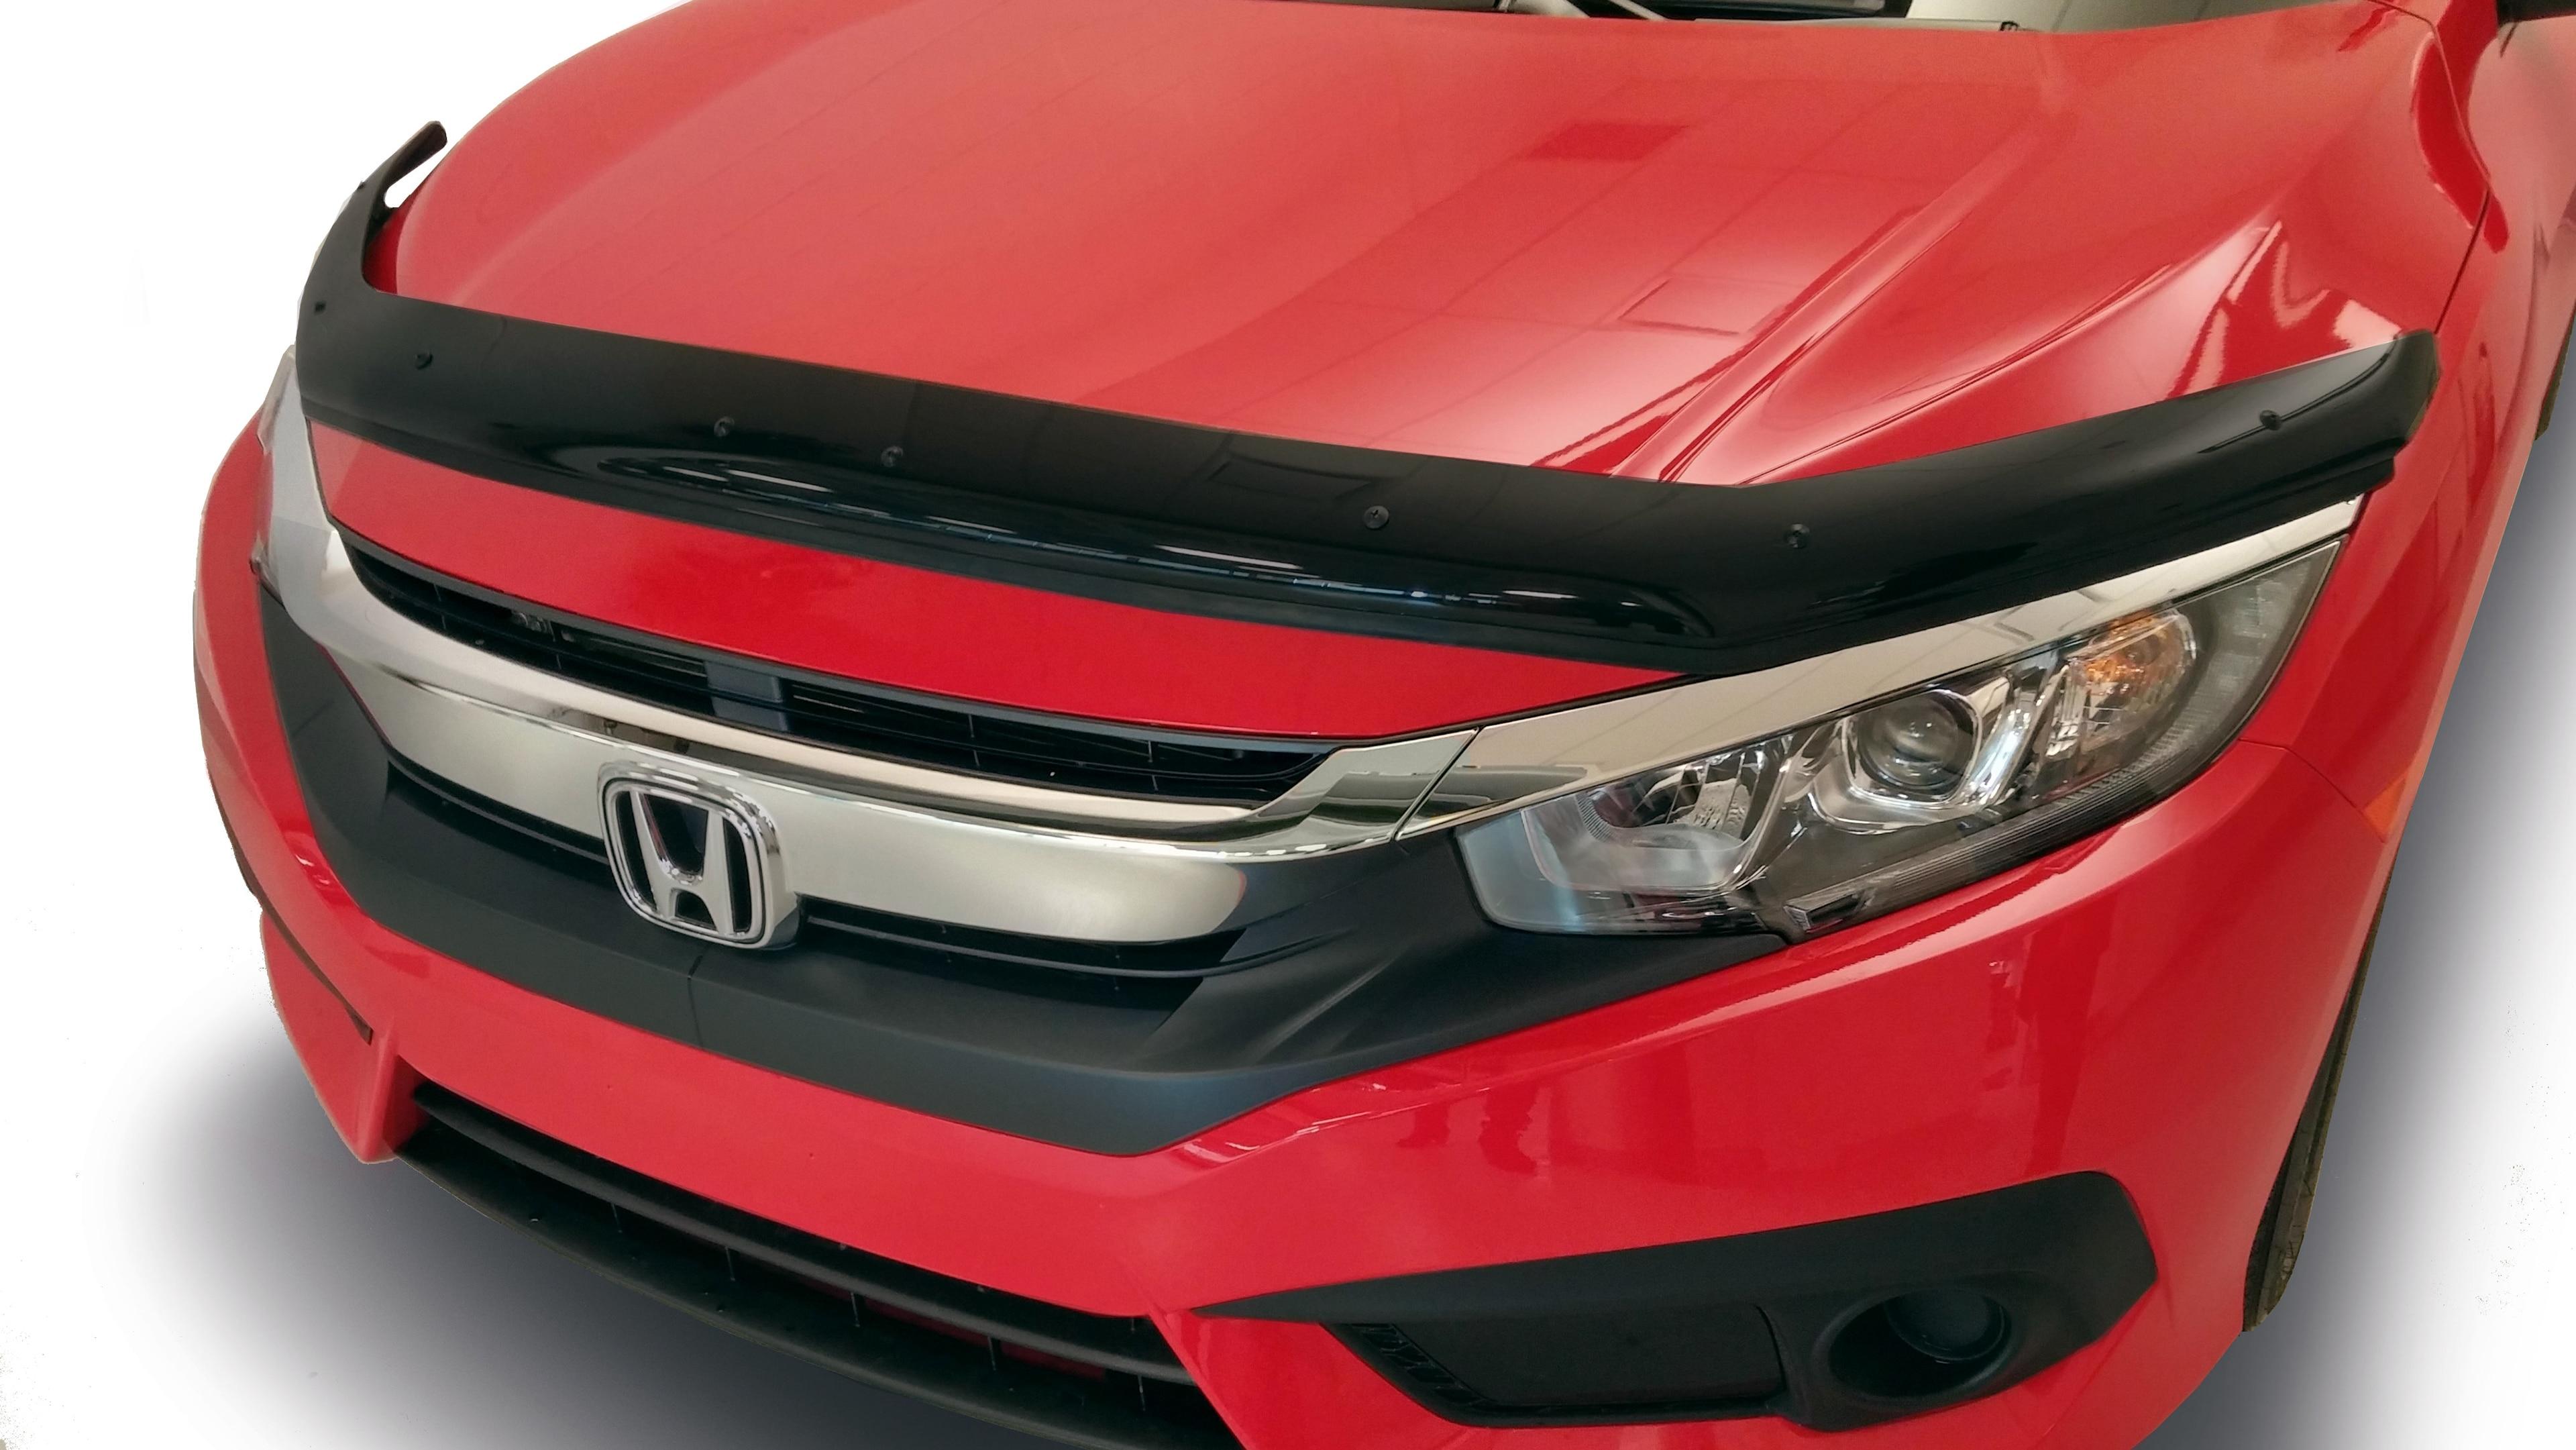 Accessories The 2019 Civic Honda Canada